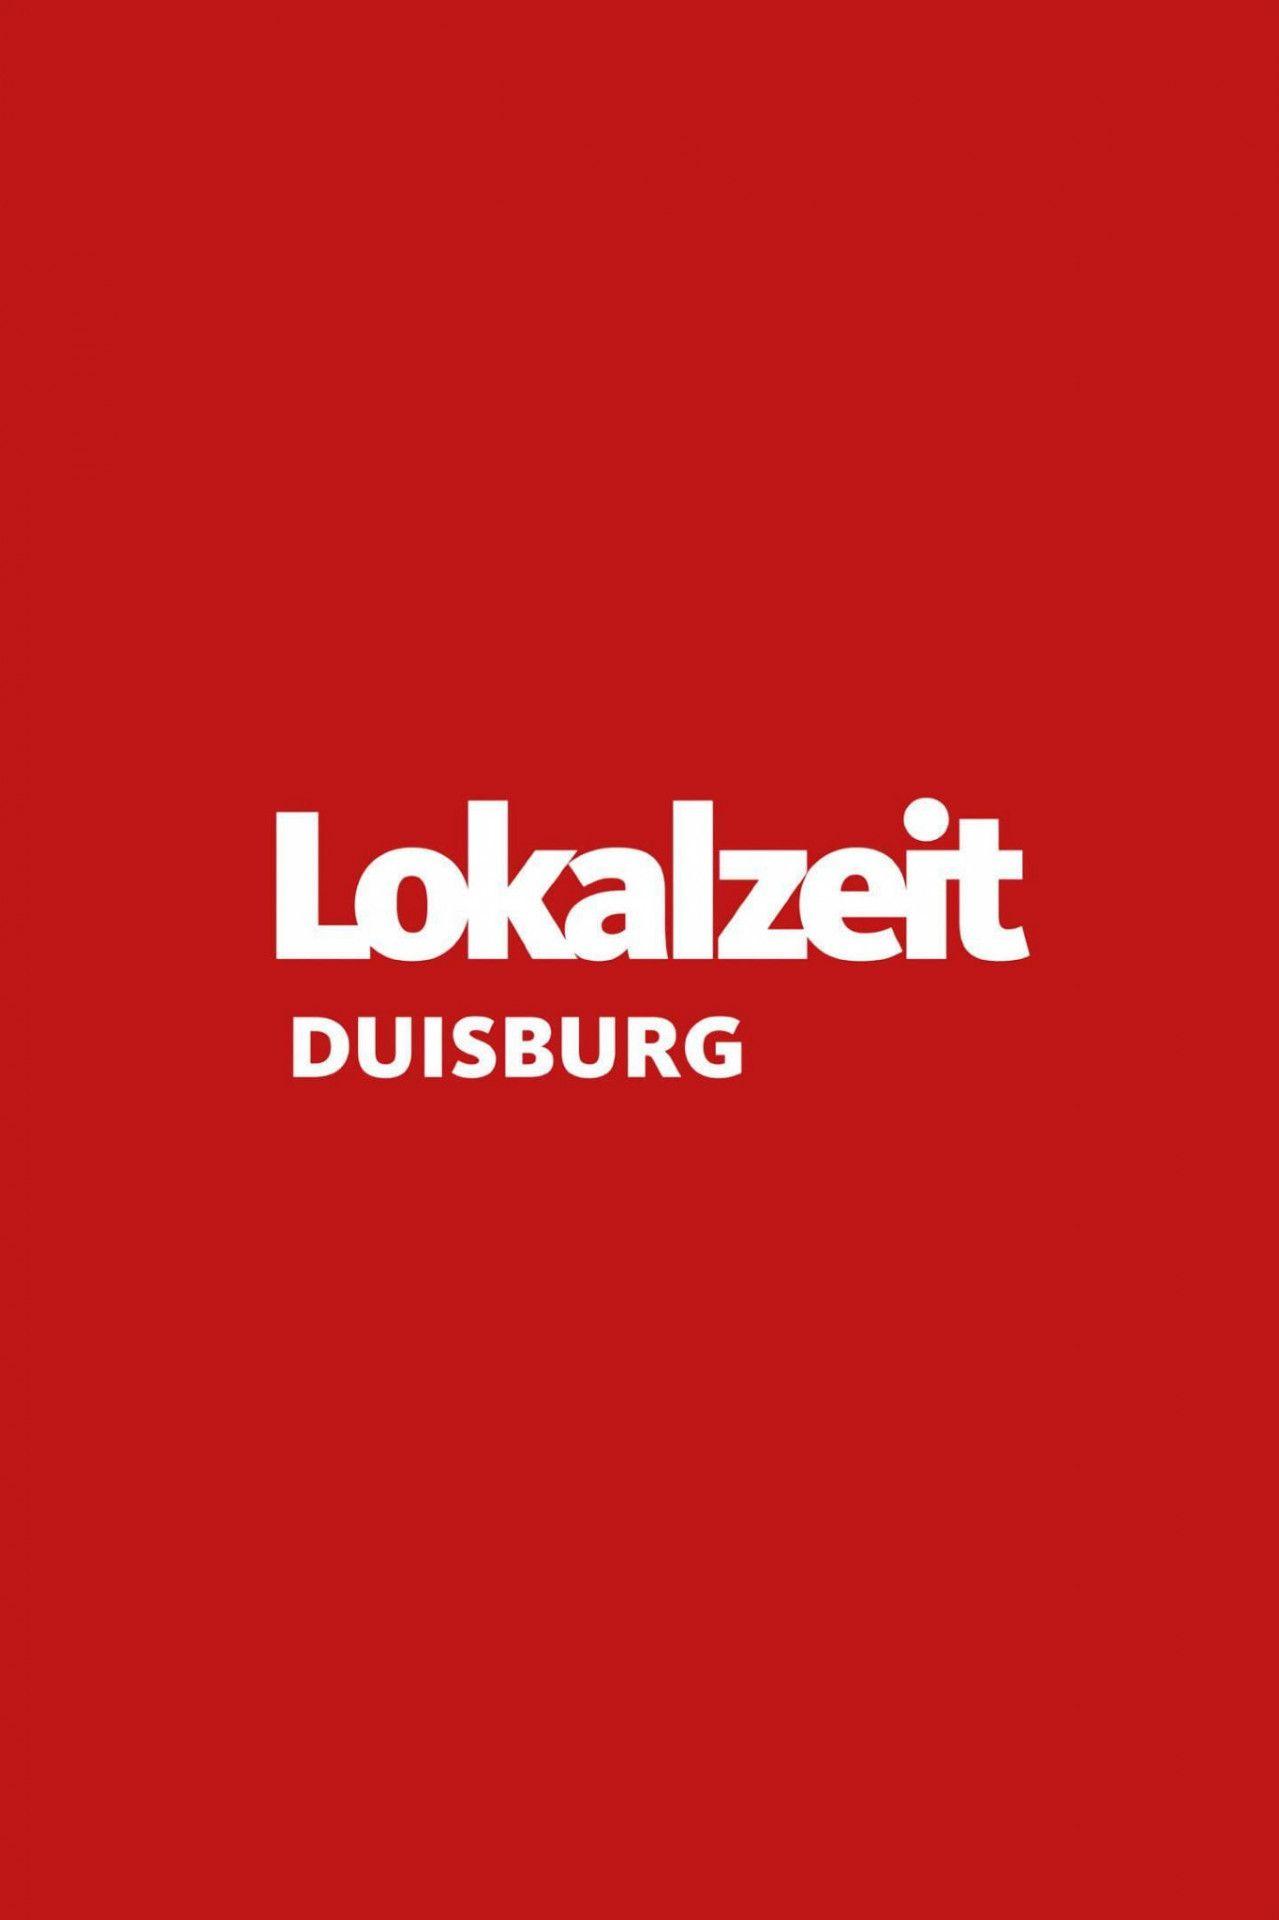 Www.Lokalzeit Duisburg.De